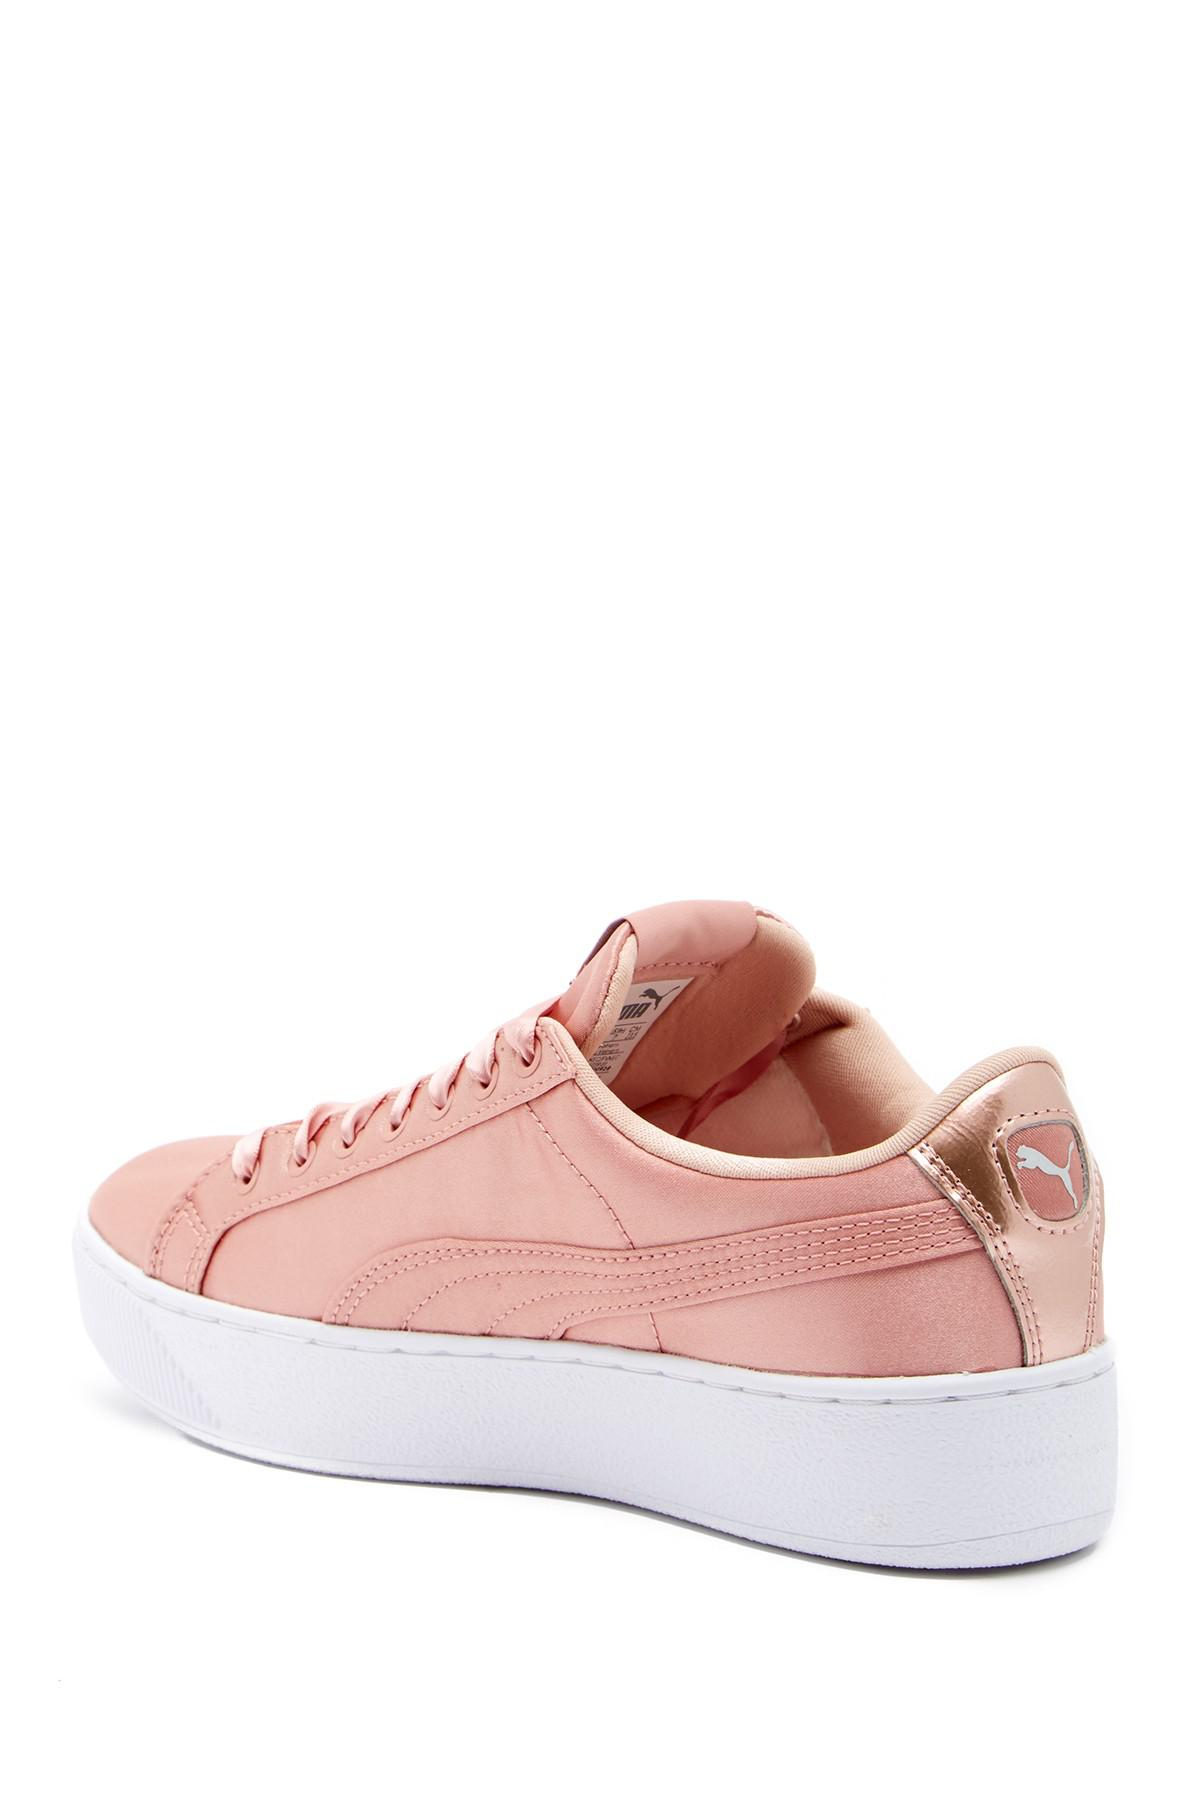 puma sneaker vikky platform ep